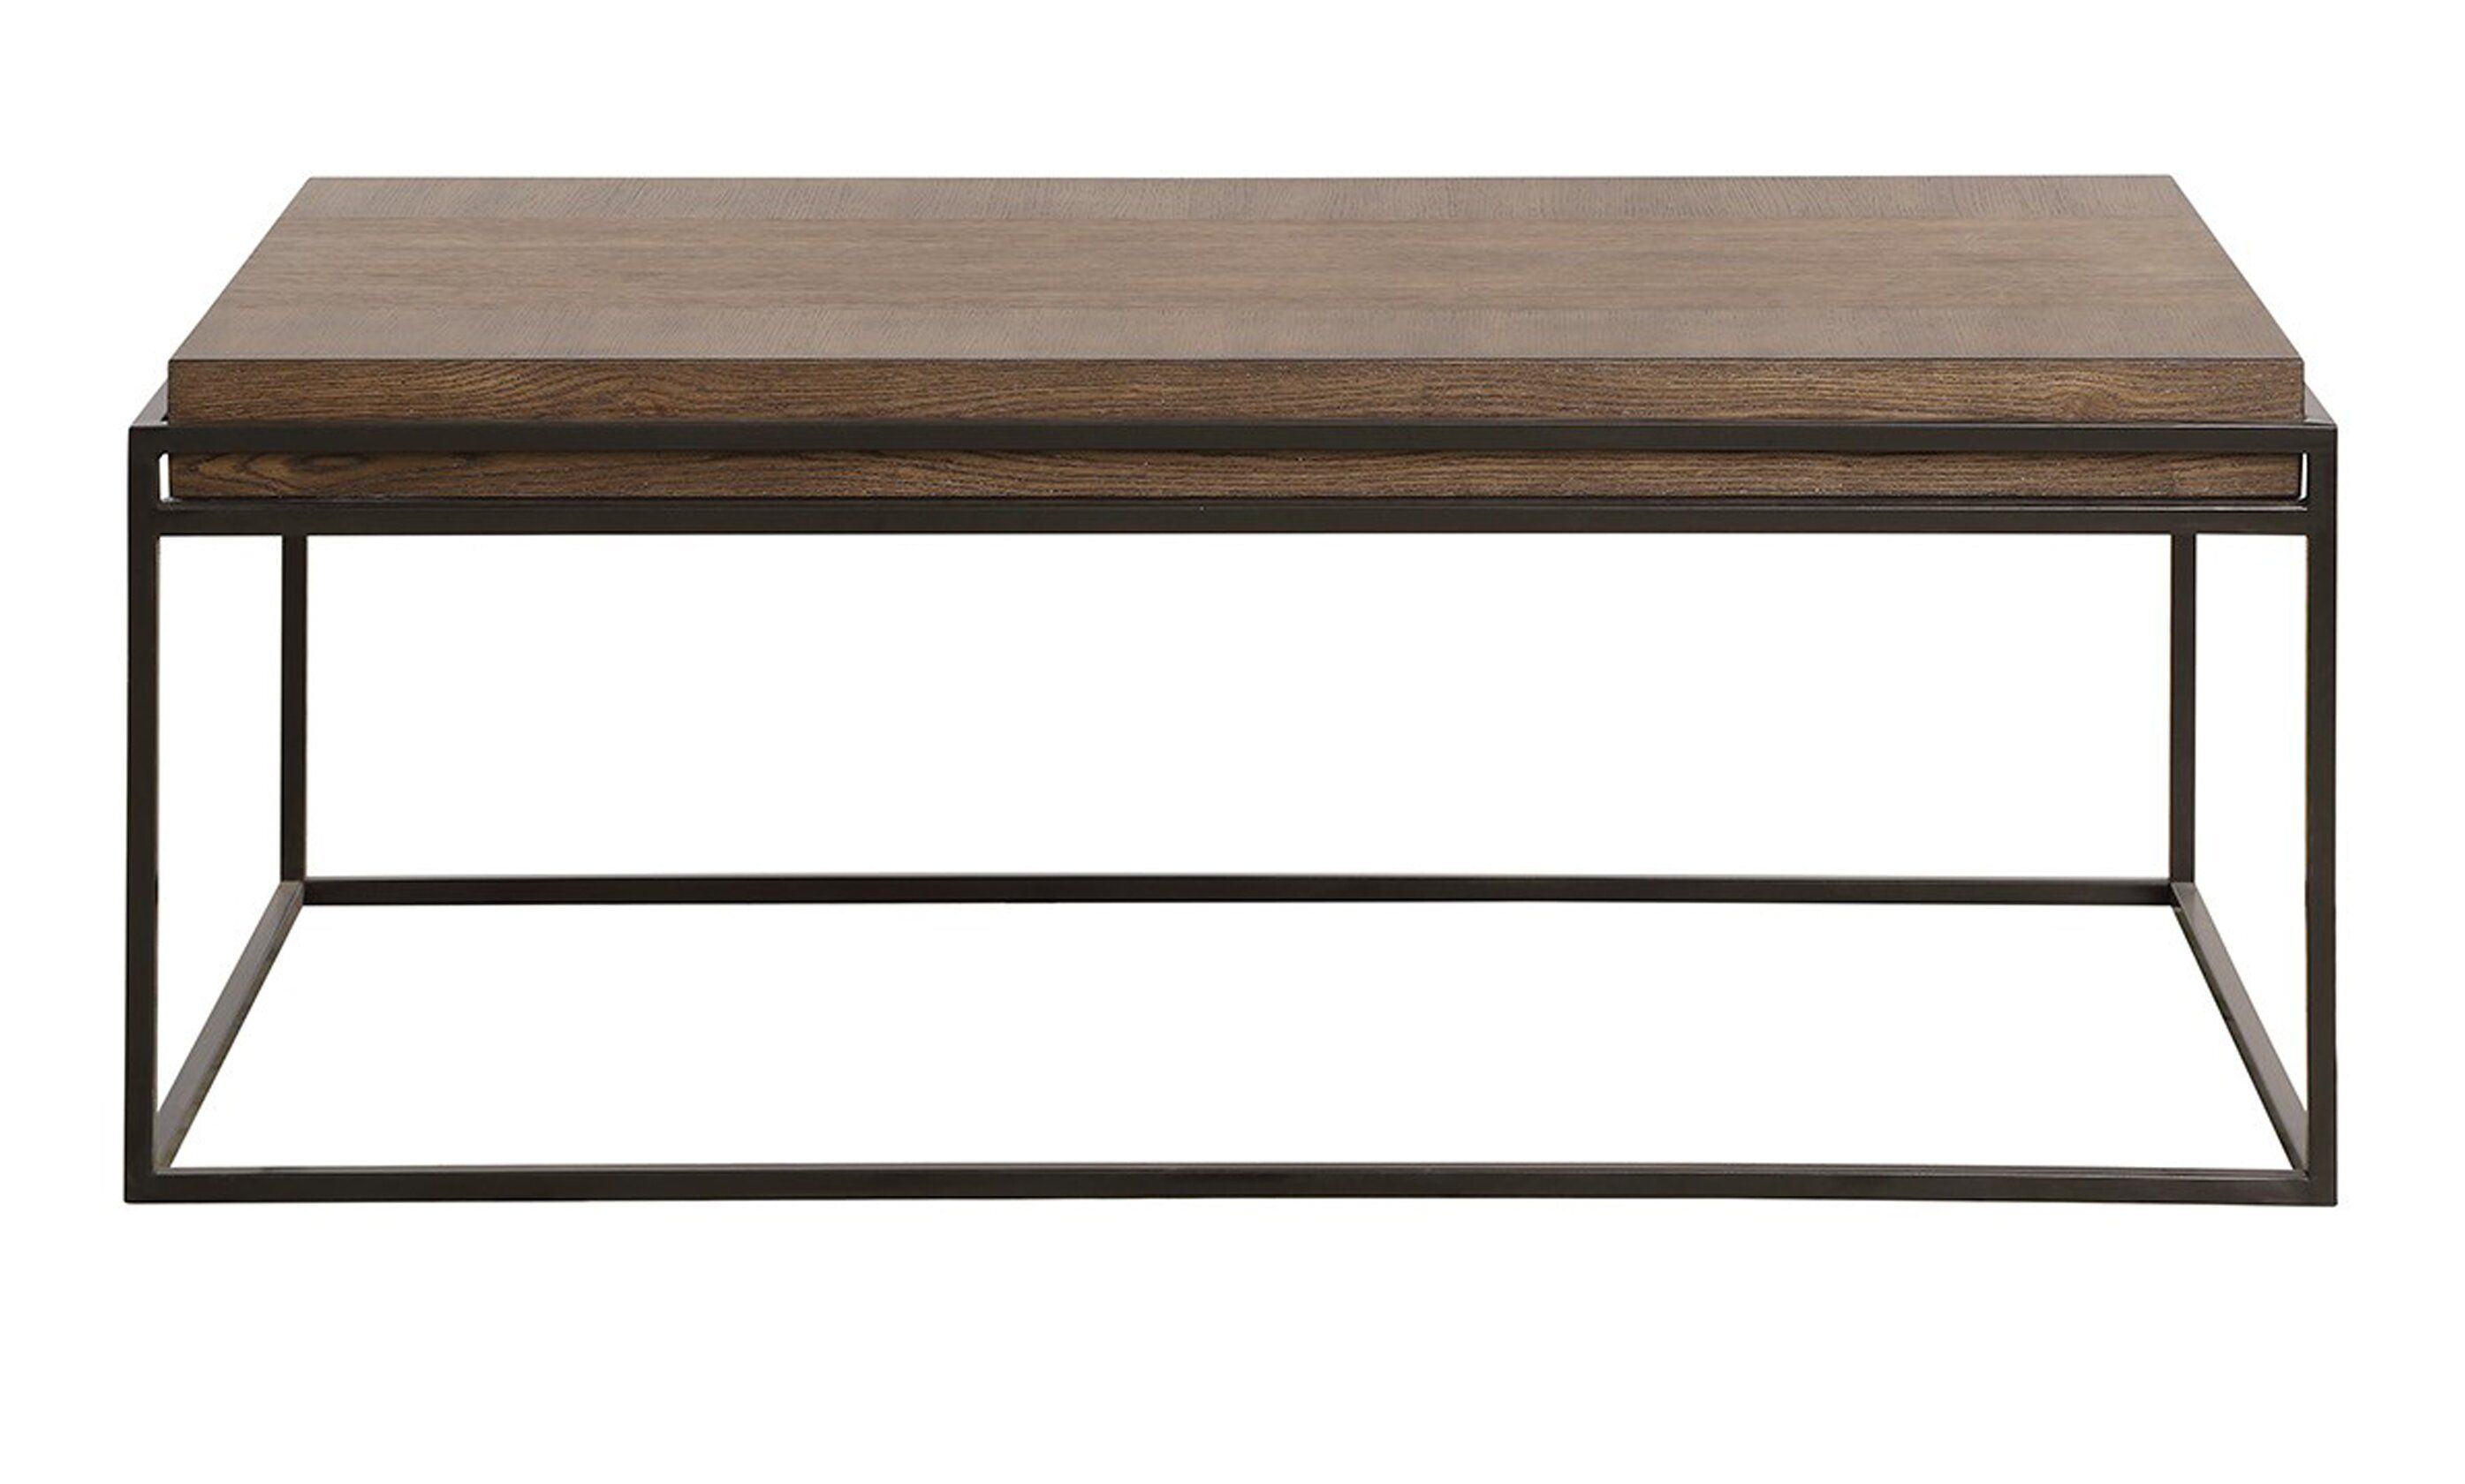 Depalma Frame Coffee Table Joss Main Coffee Table Joss And Main Coffee Table Table [ 1680 x 2790 Pixel ]